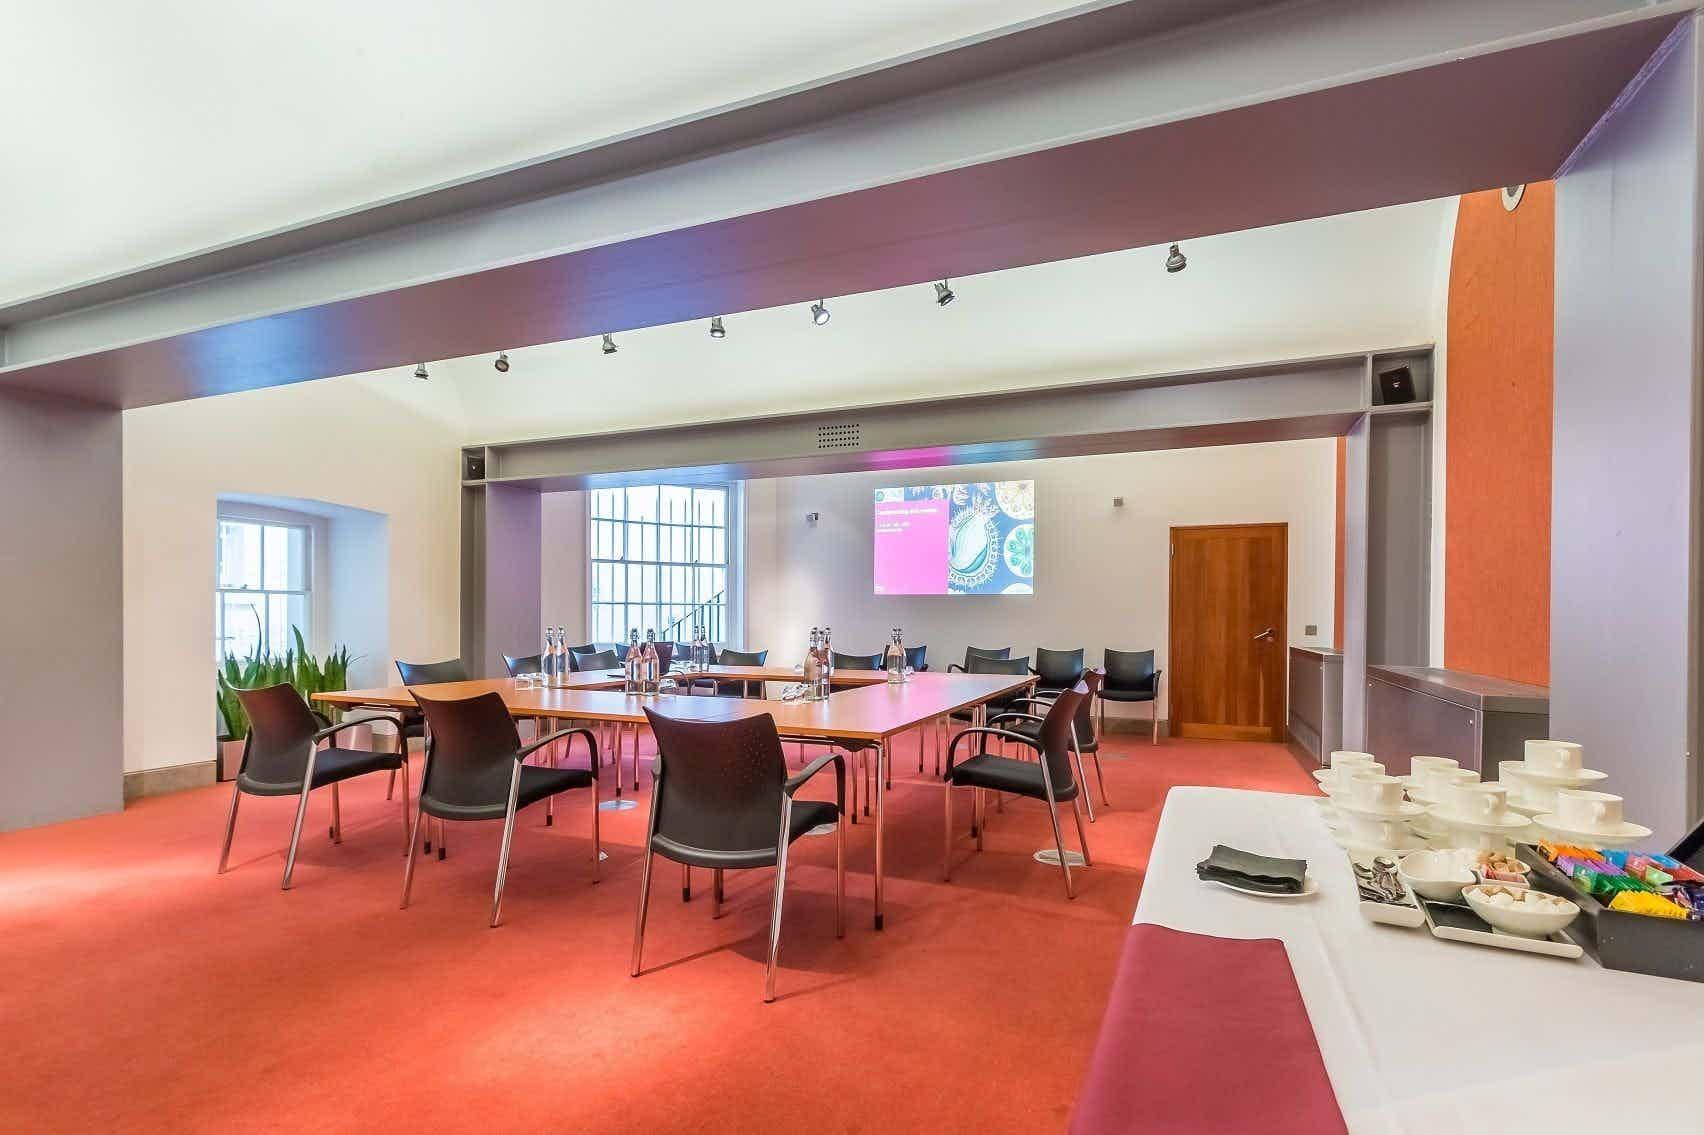 Brian Mercer Room., The Royal Society